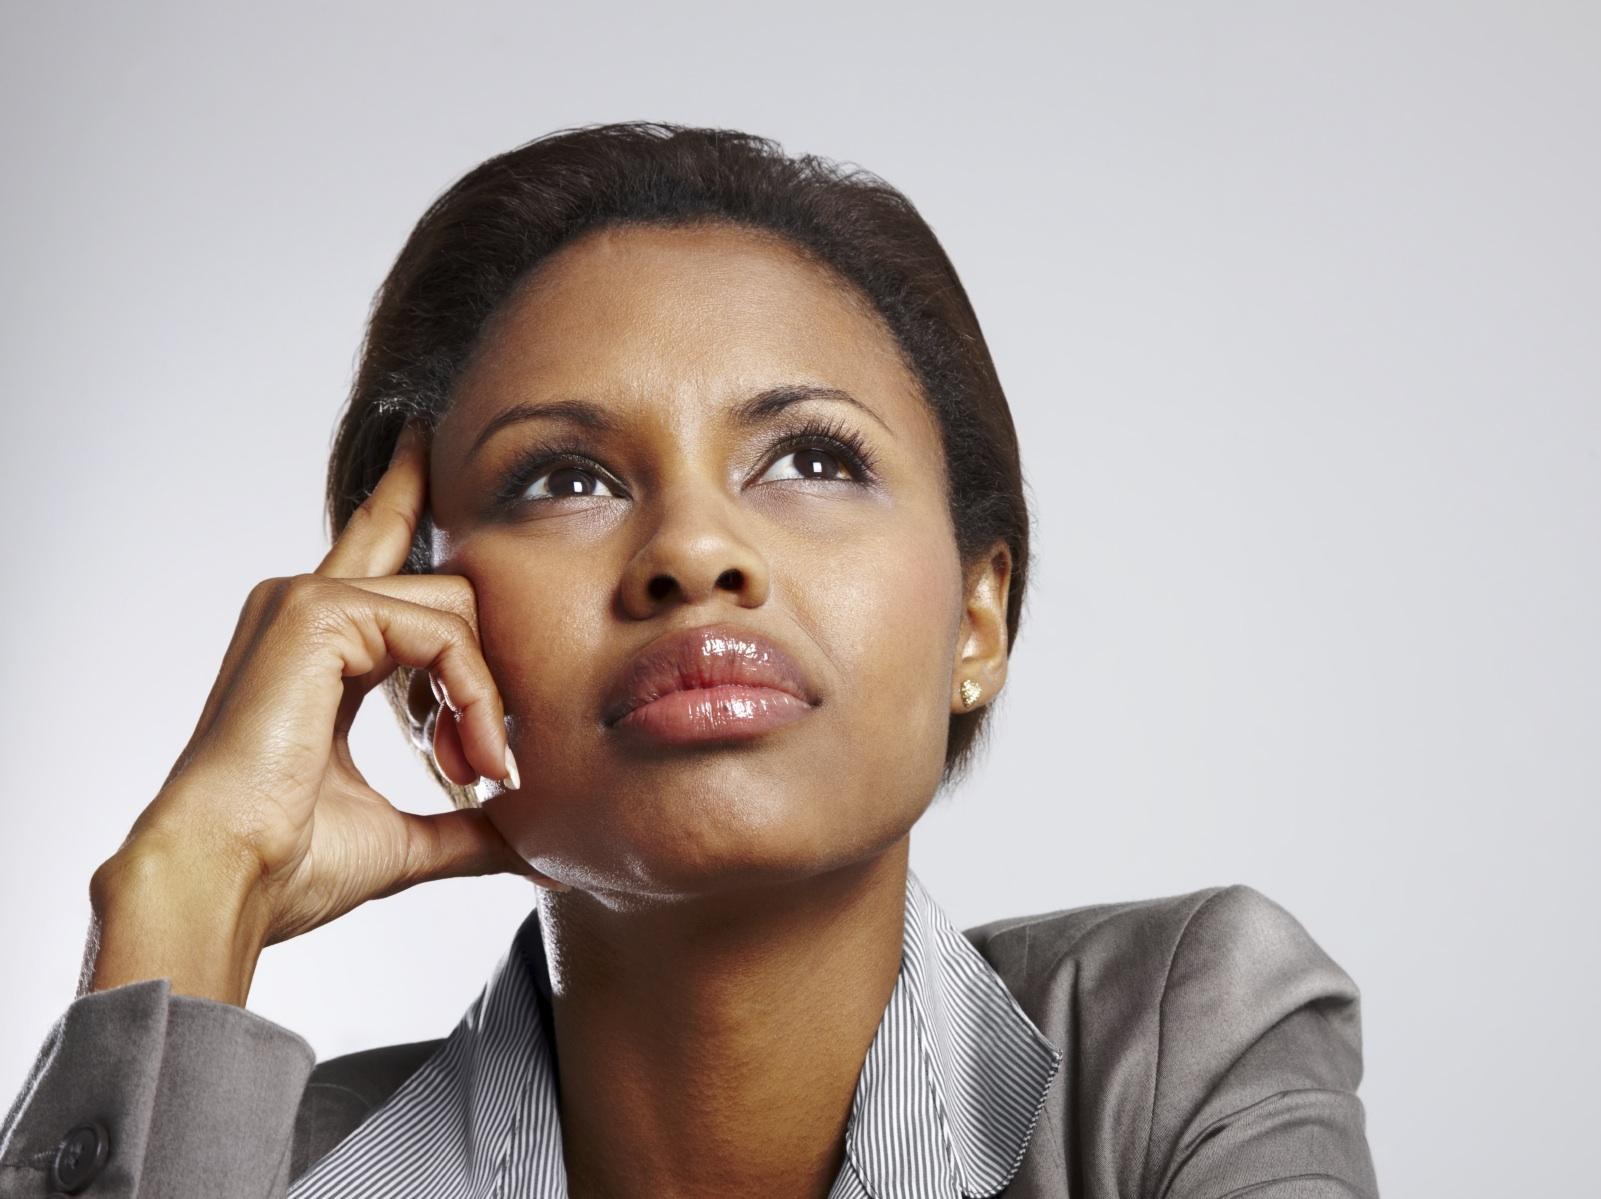 http://www.rippdemup.com/wp-content/uploads/2012/12/yolanda-spivey_black-woman-pretends-to-be-white-to-get-job1.jpg